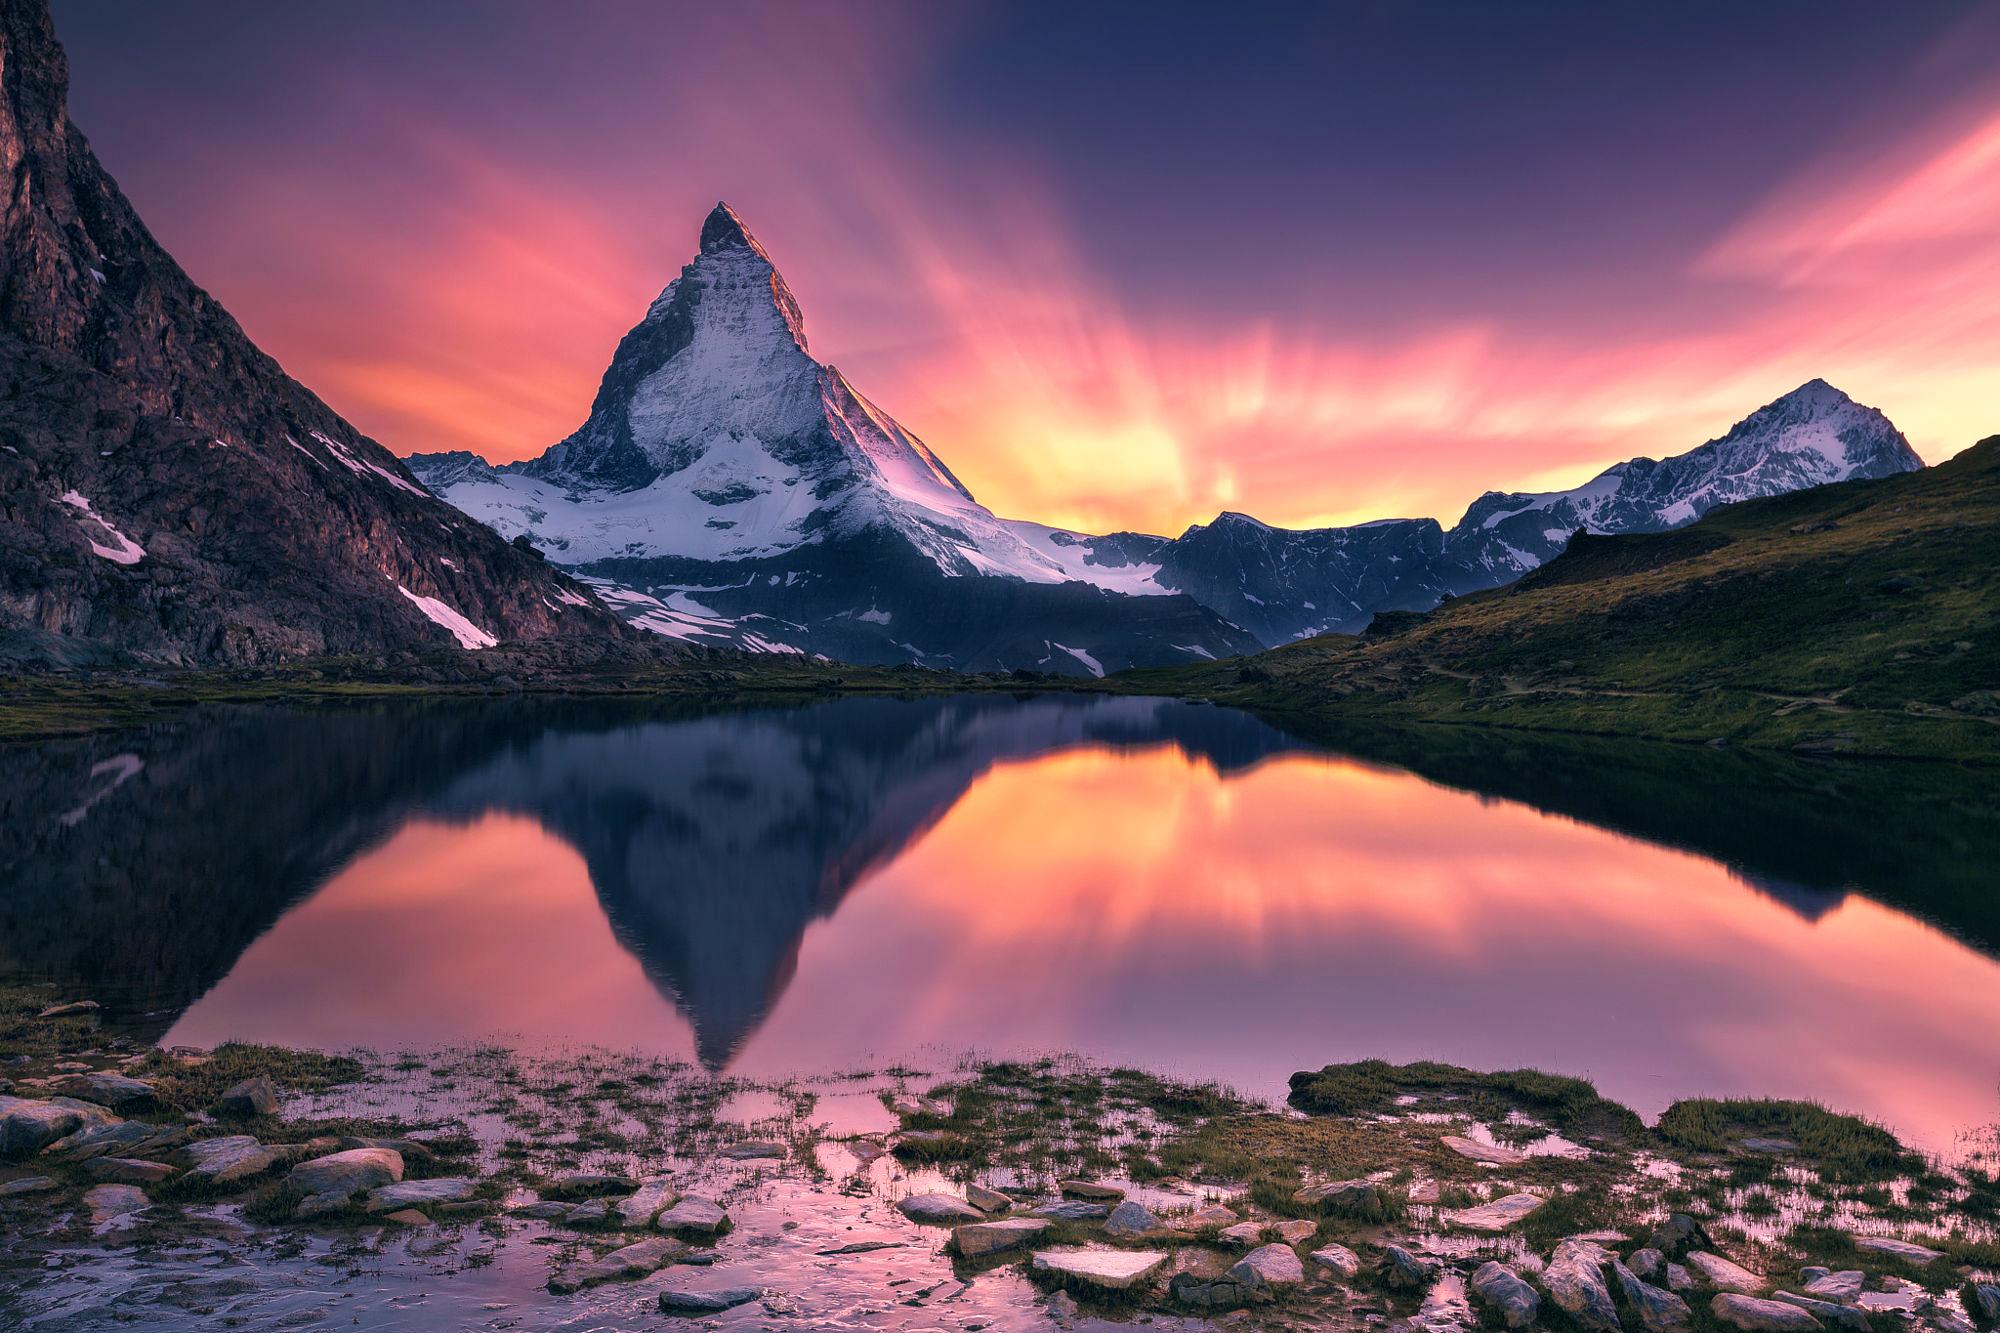 Beautiful Wallpaper Mountain Nokia - matterhorn-mountains-ap  Image_175046.jpg